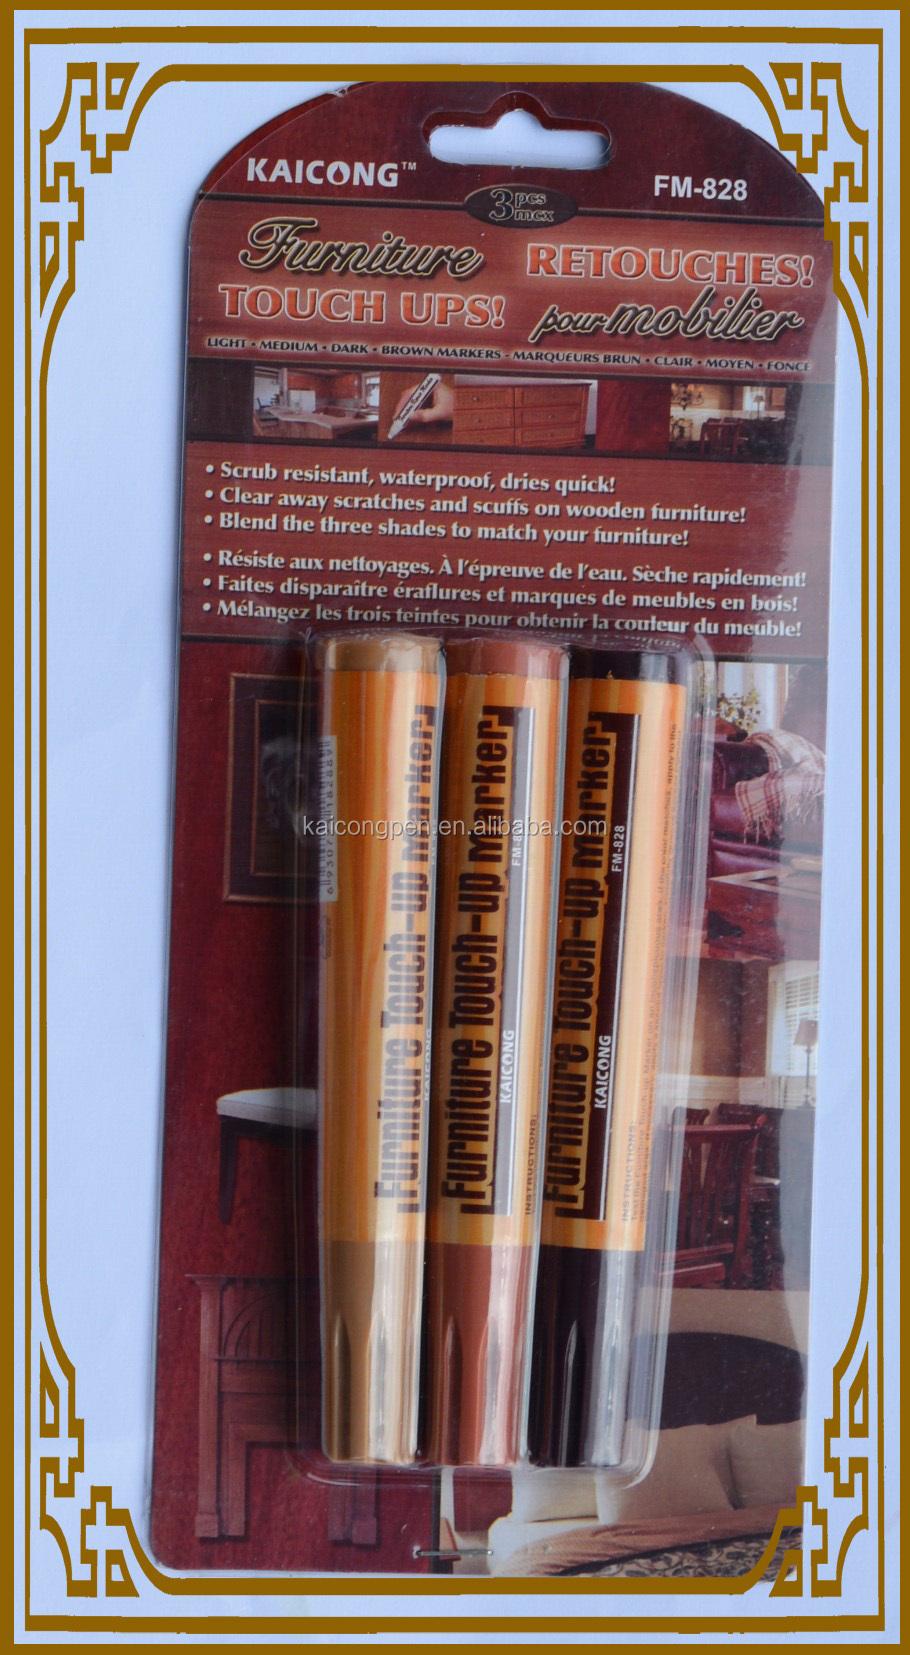 Muebles De Madera Retoque Marcadores Madera Mancha Reparaci N Del  # Muebles Toxicos